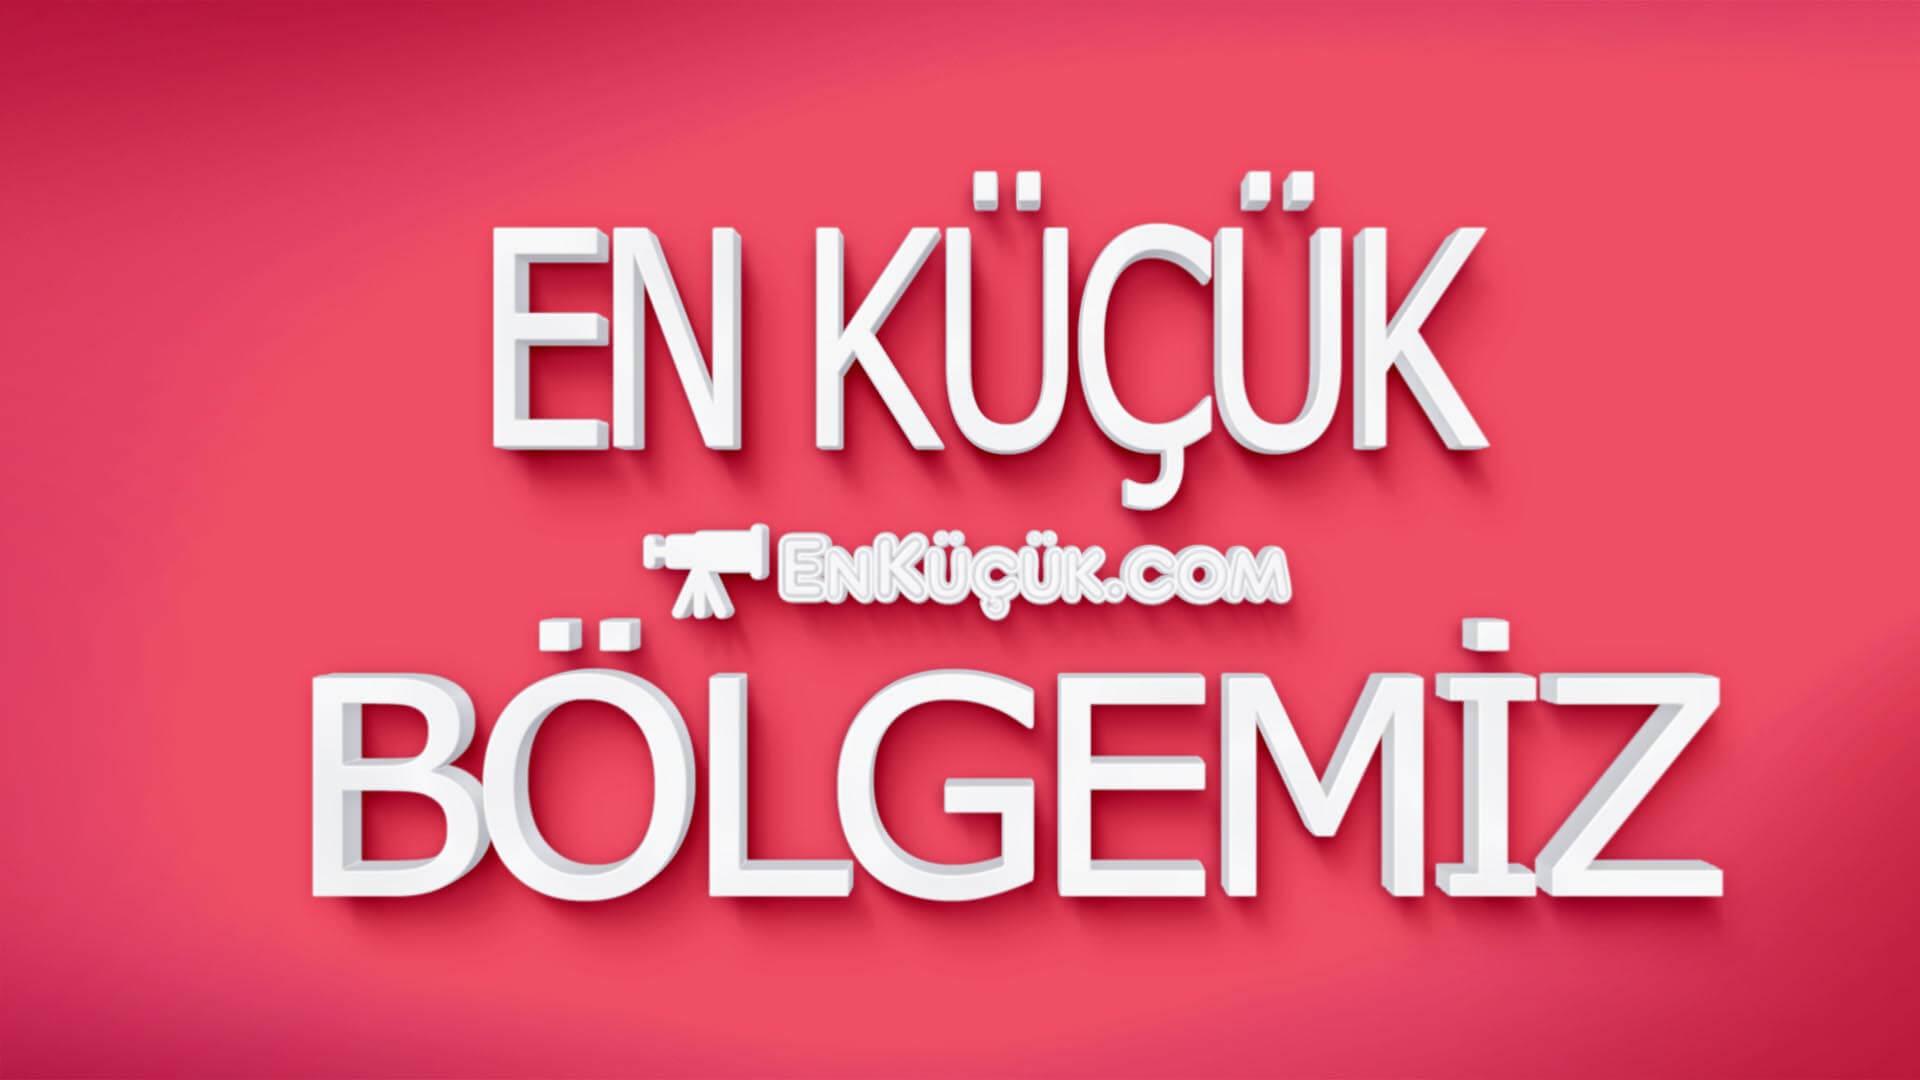 En küçük bölgemiz? En Küçük Bölgemiz hangisidir? Yüzölçümü en küçük bölge hangisidir? Türkiye'nin en küçük bölgesi hangisidir?